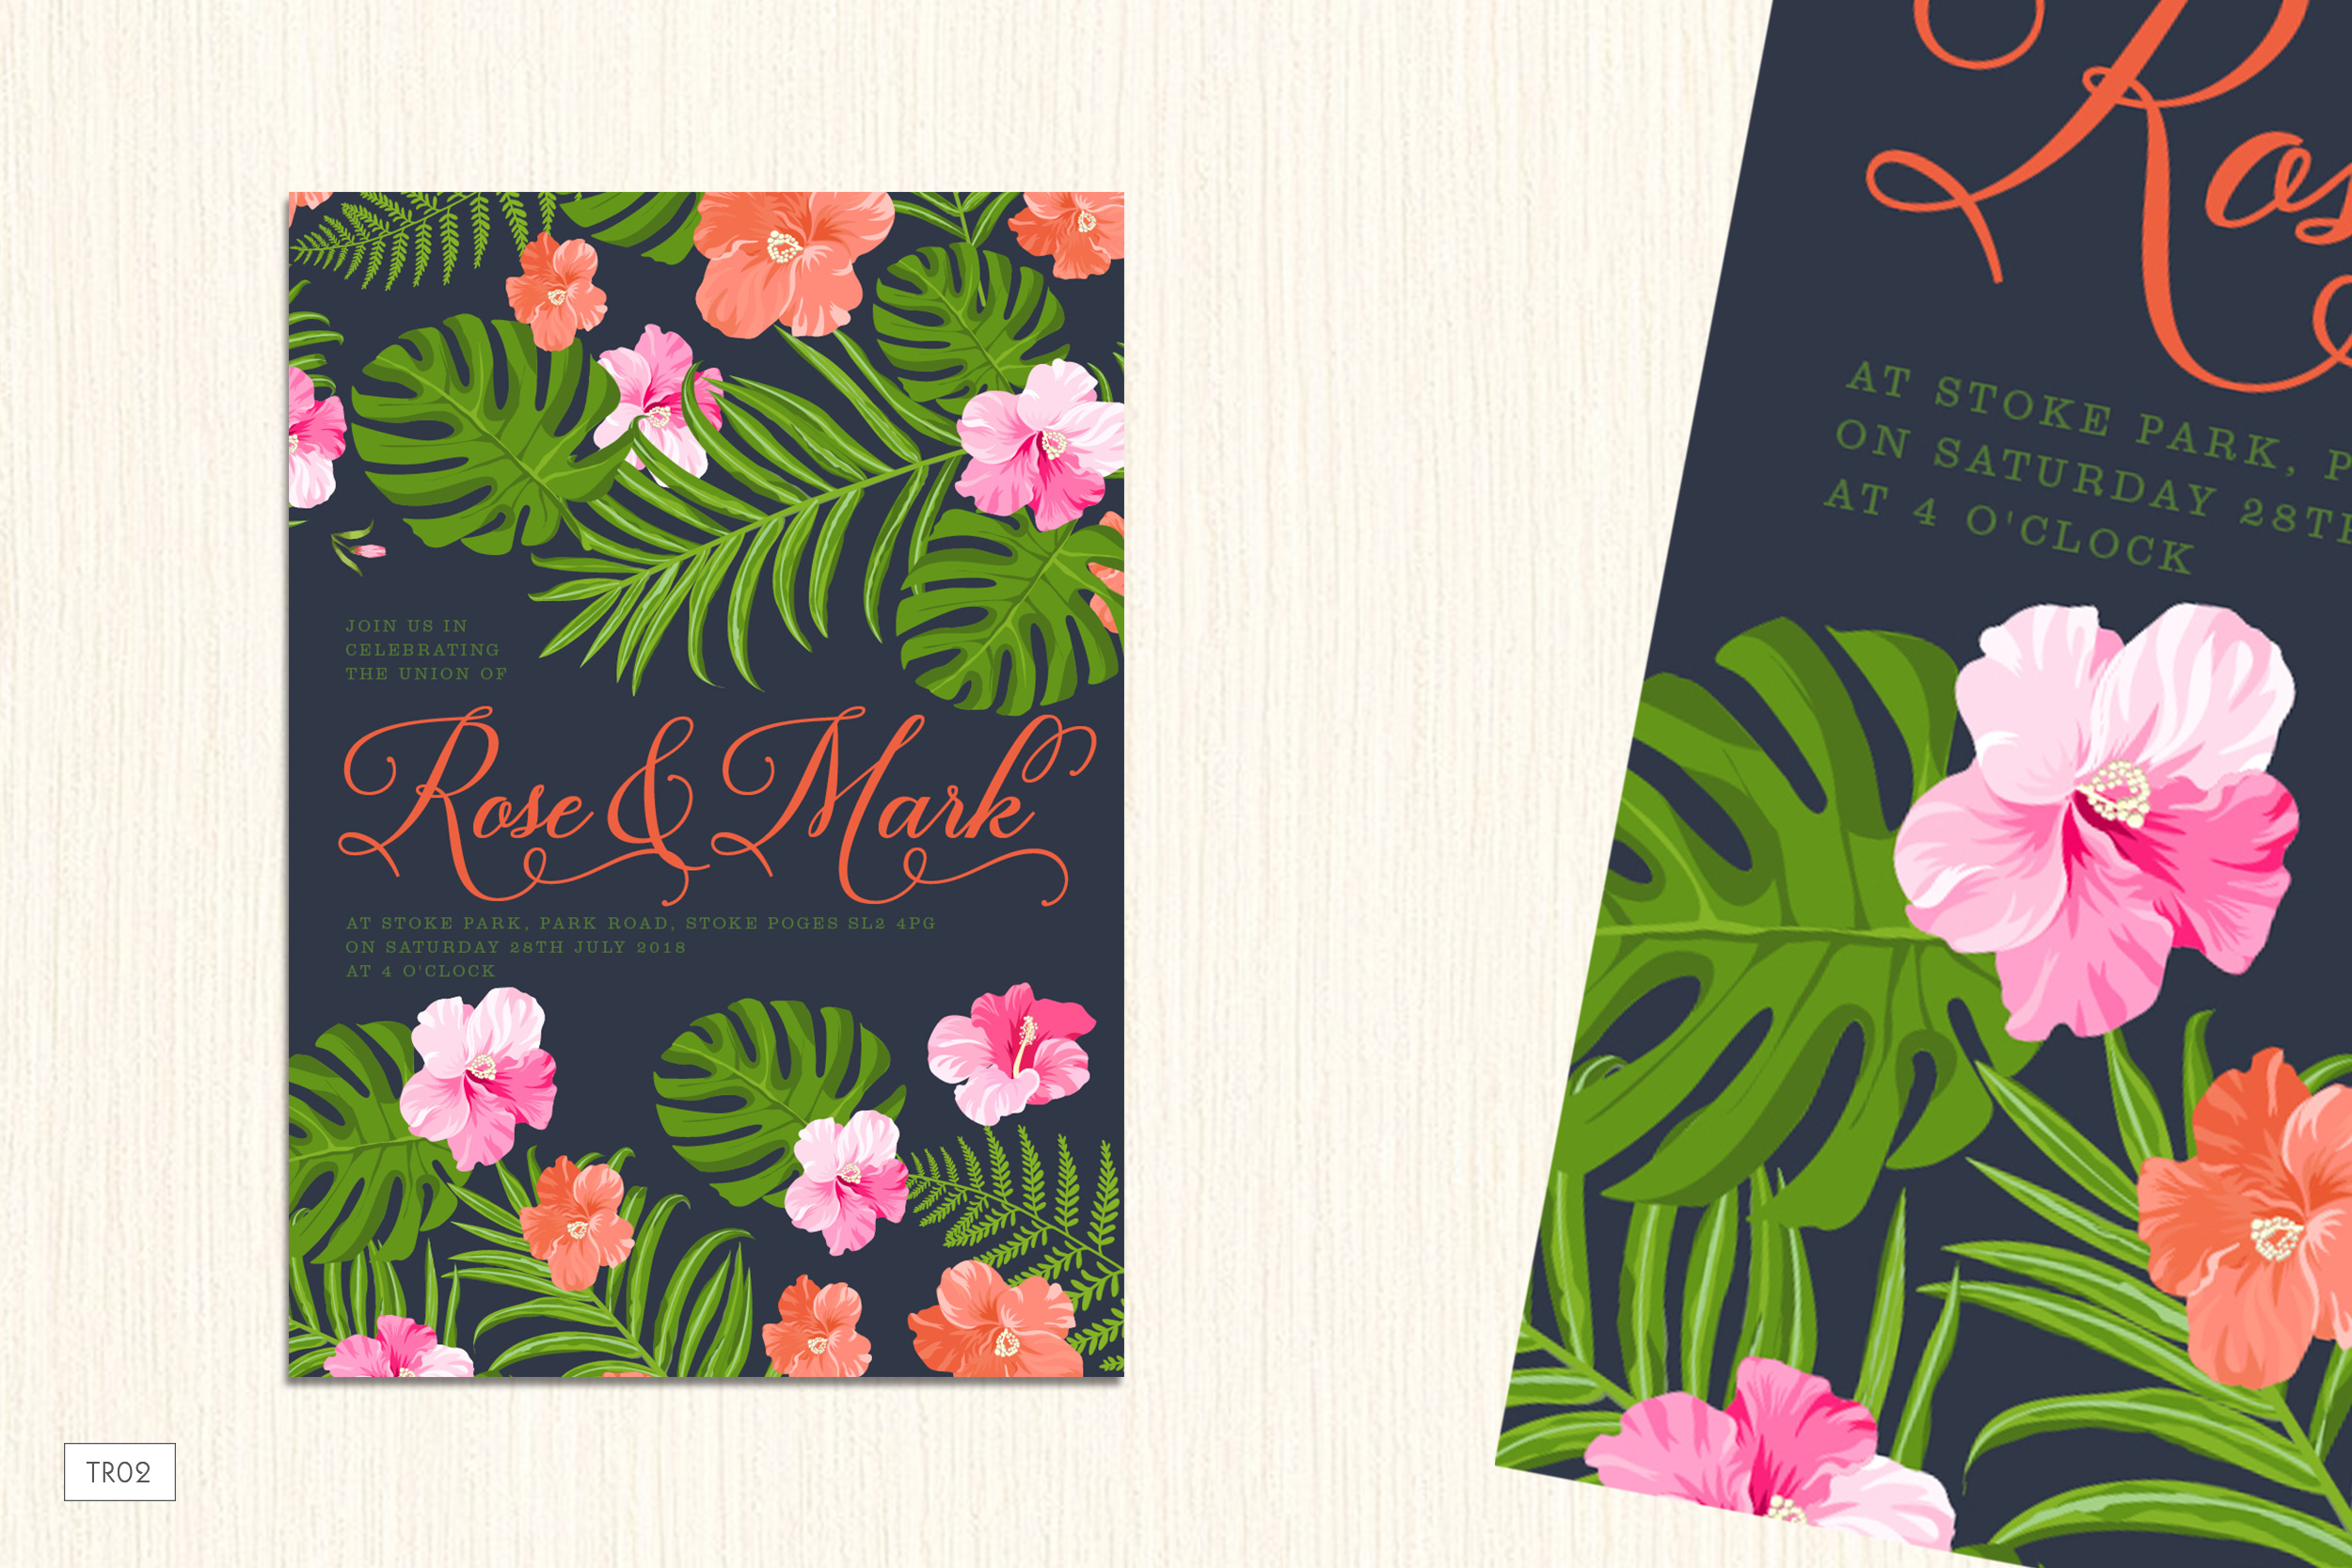 tr02-tropics-wedding-invitation.jpg